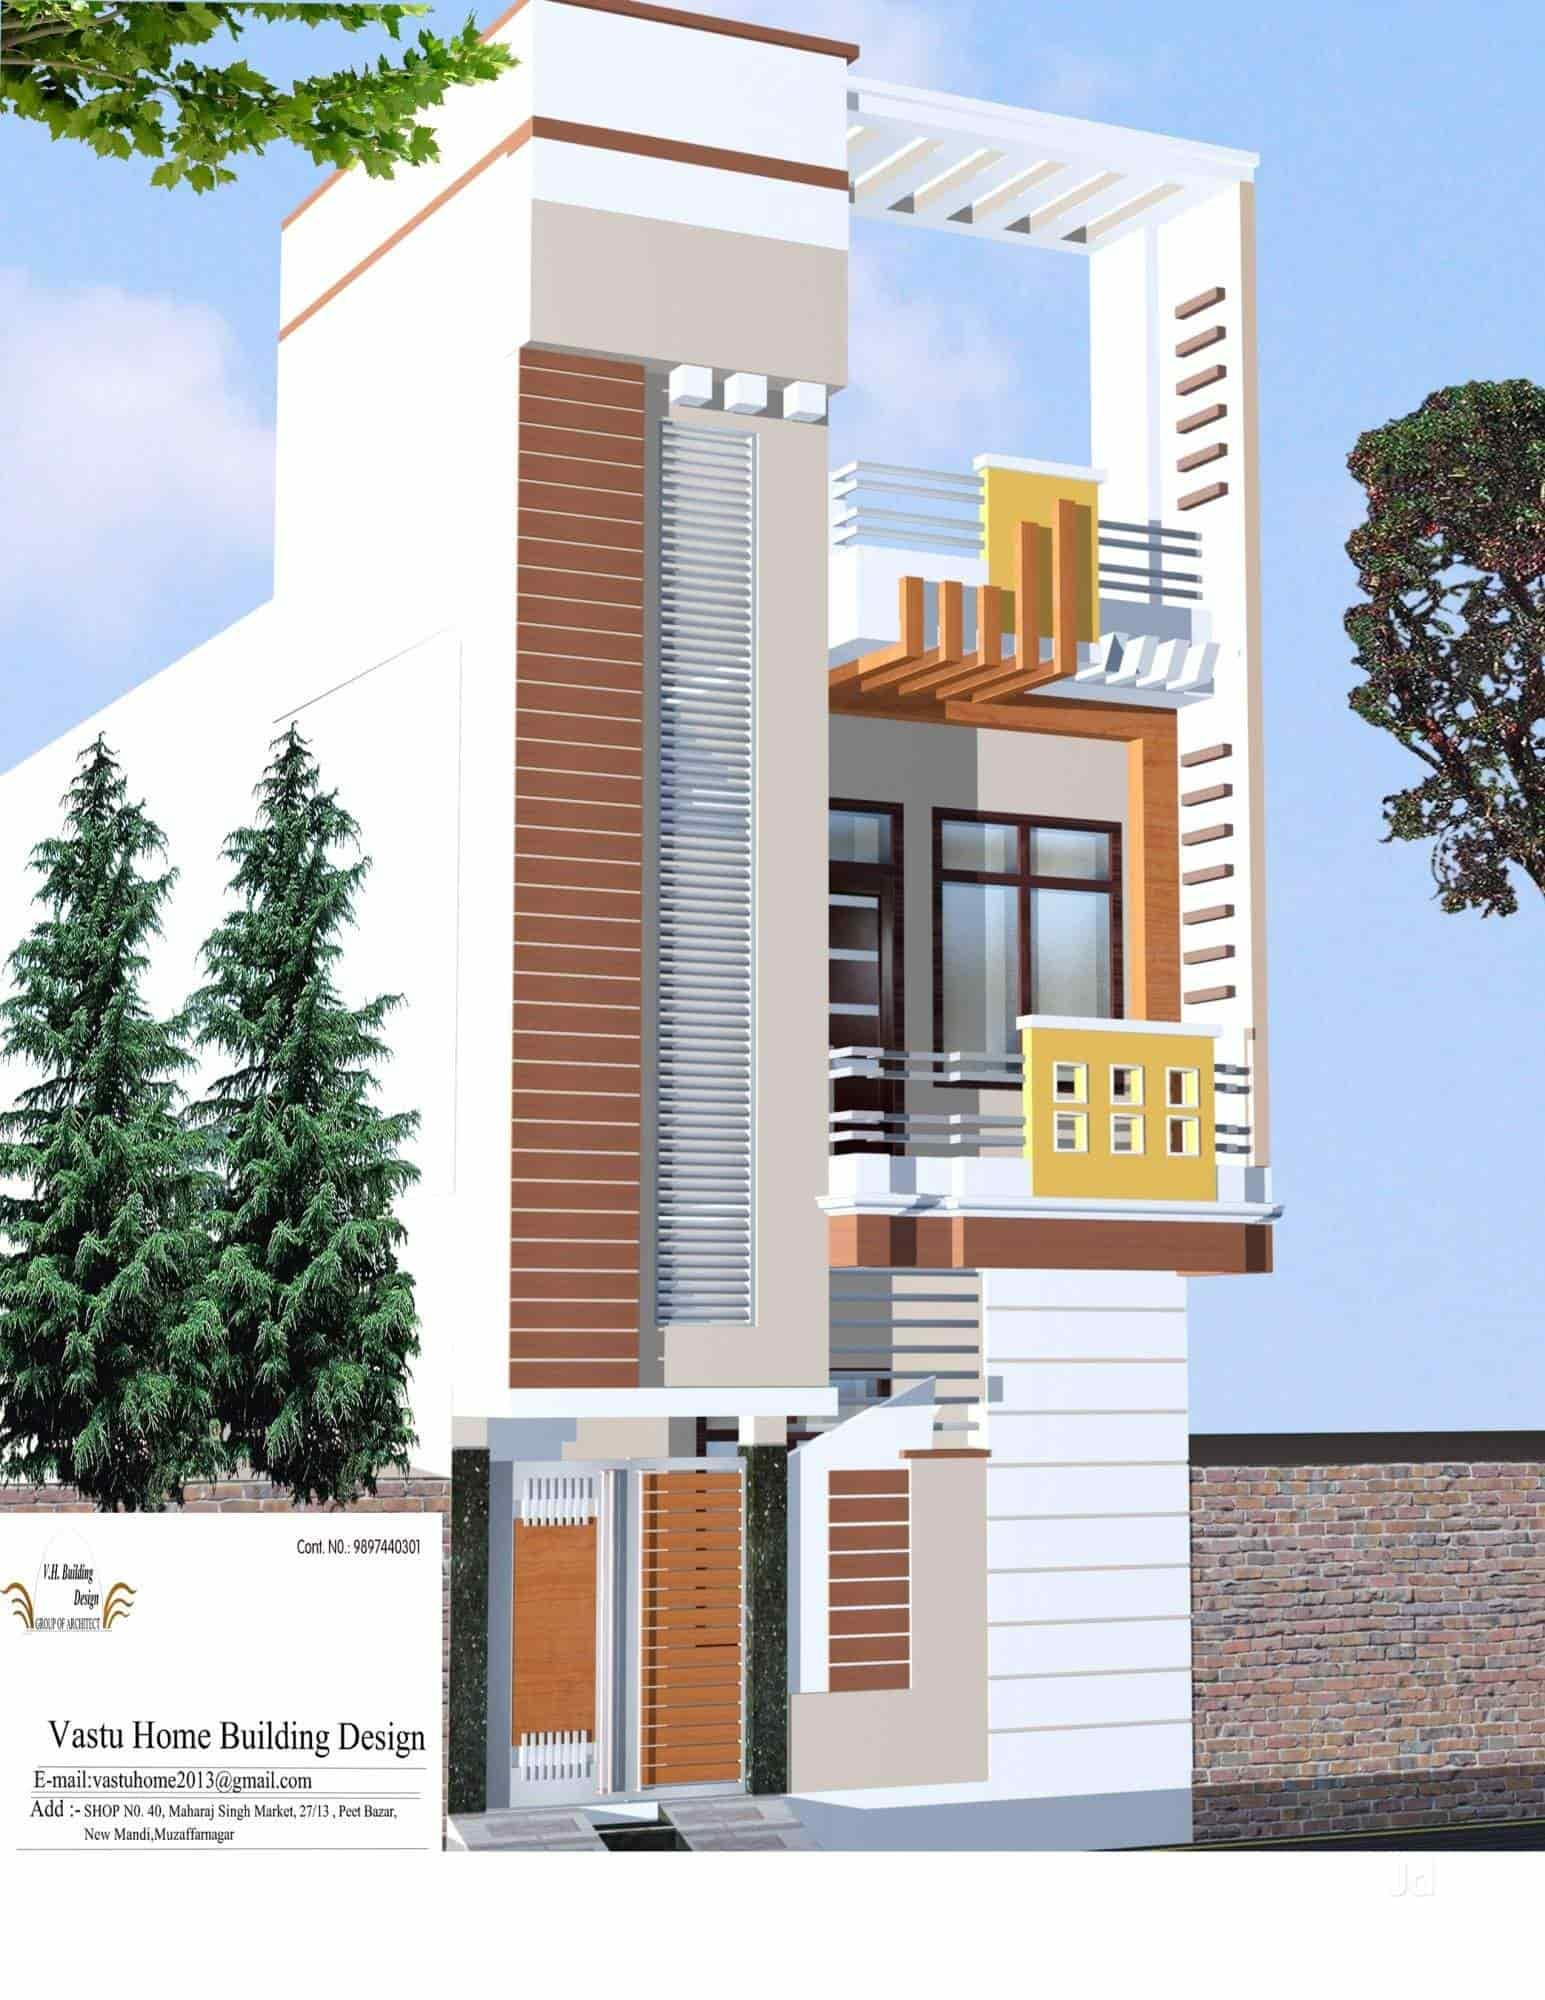 vastu home building design photos new mandi muzaffarnagar